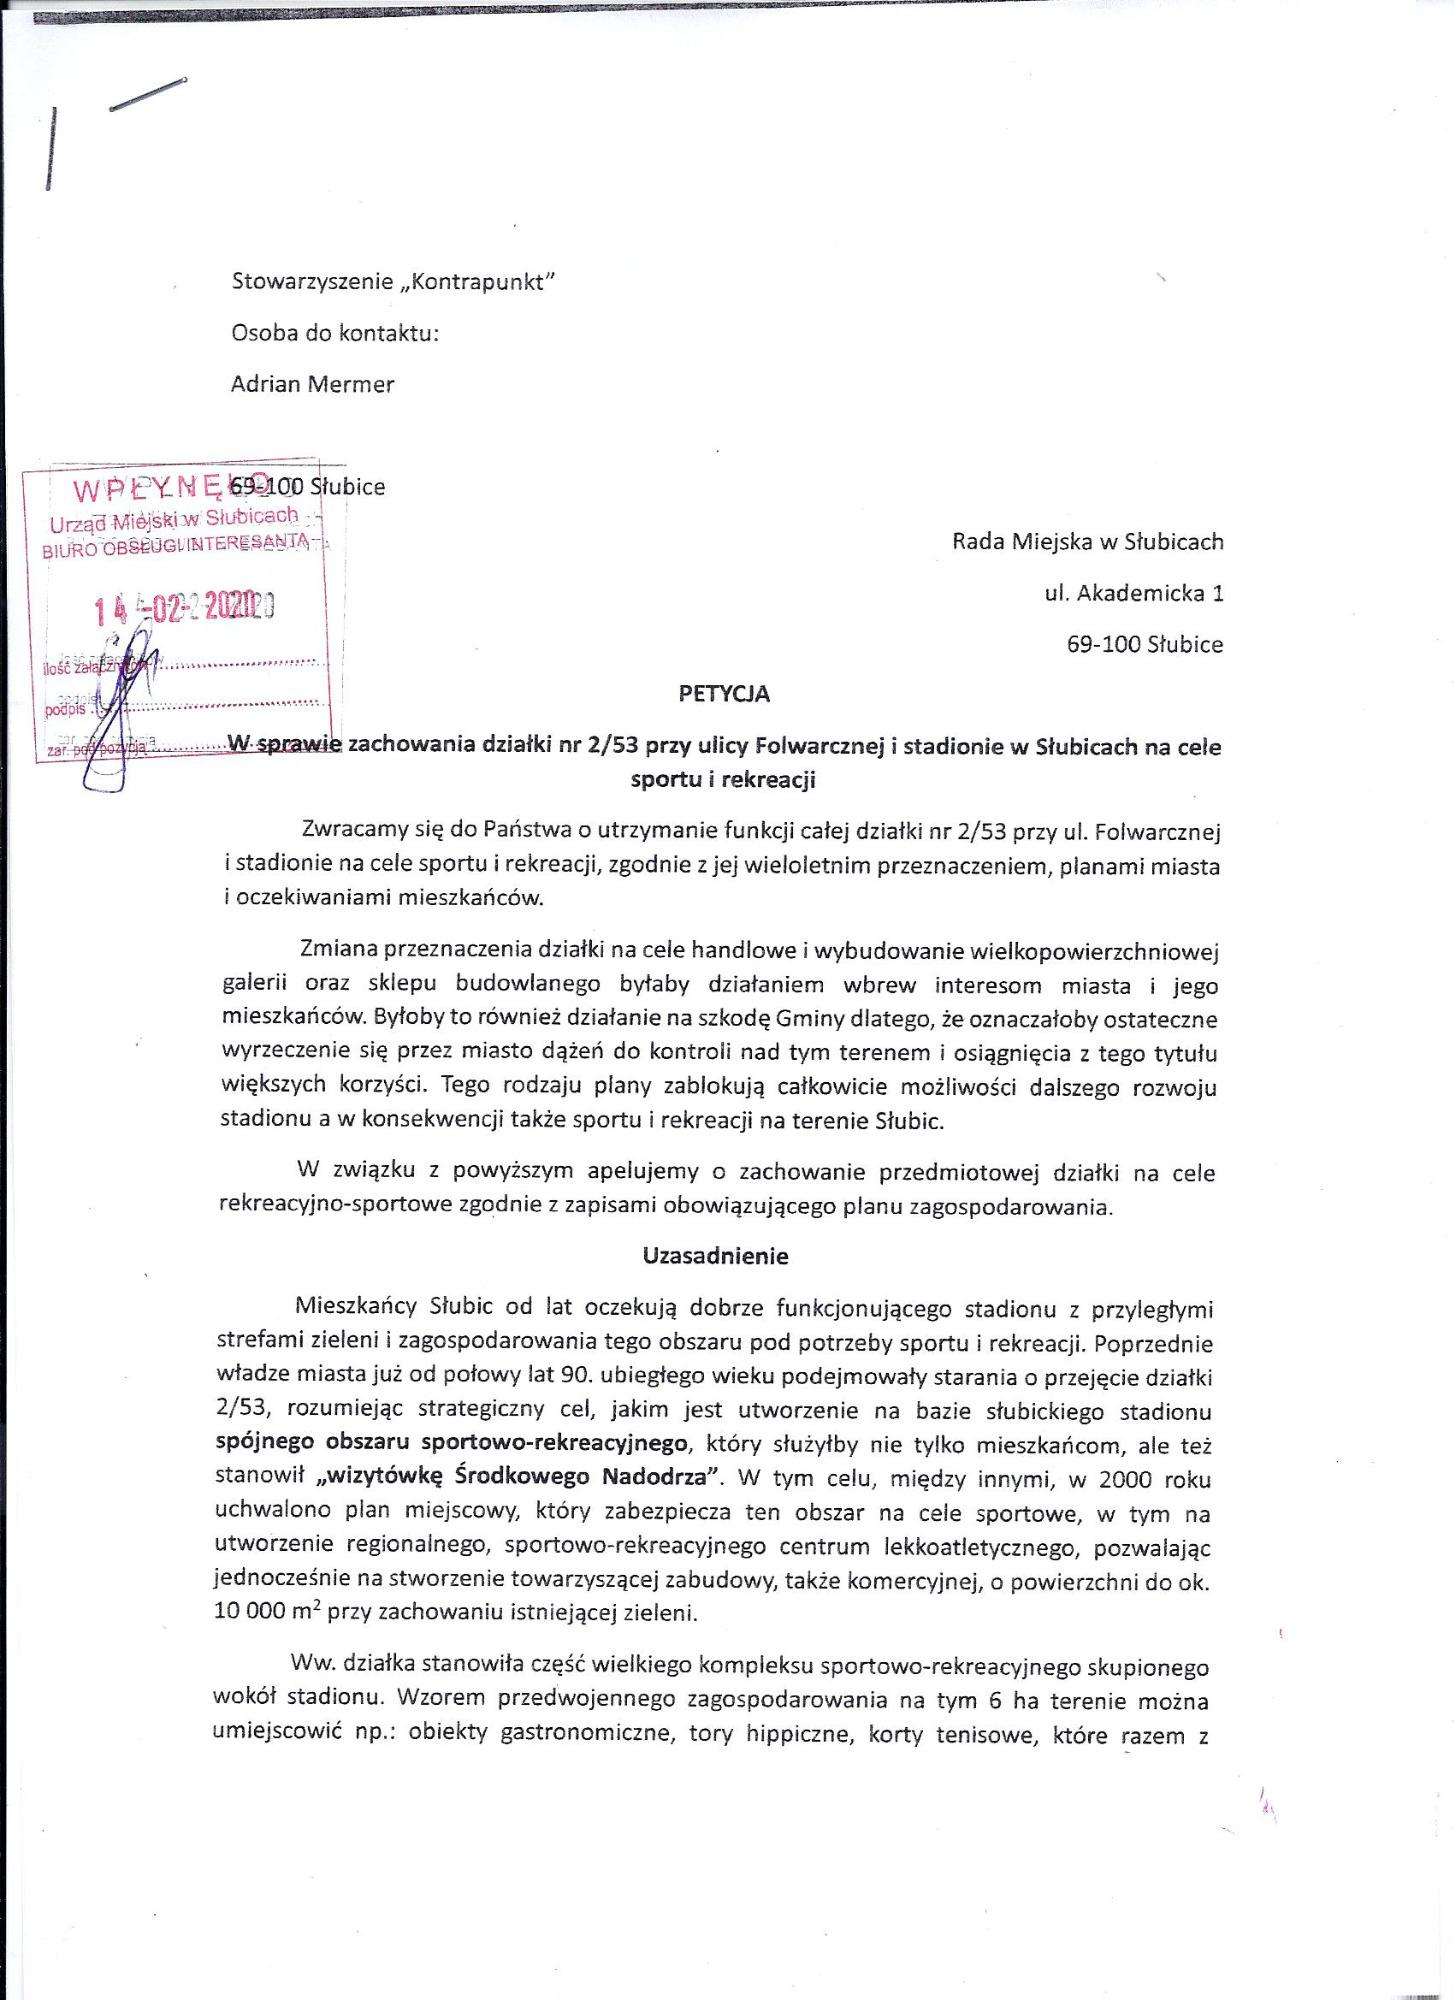 Petycja_1a.jpg